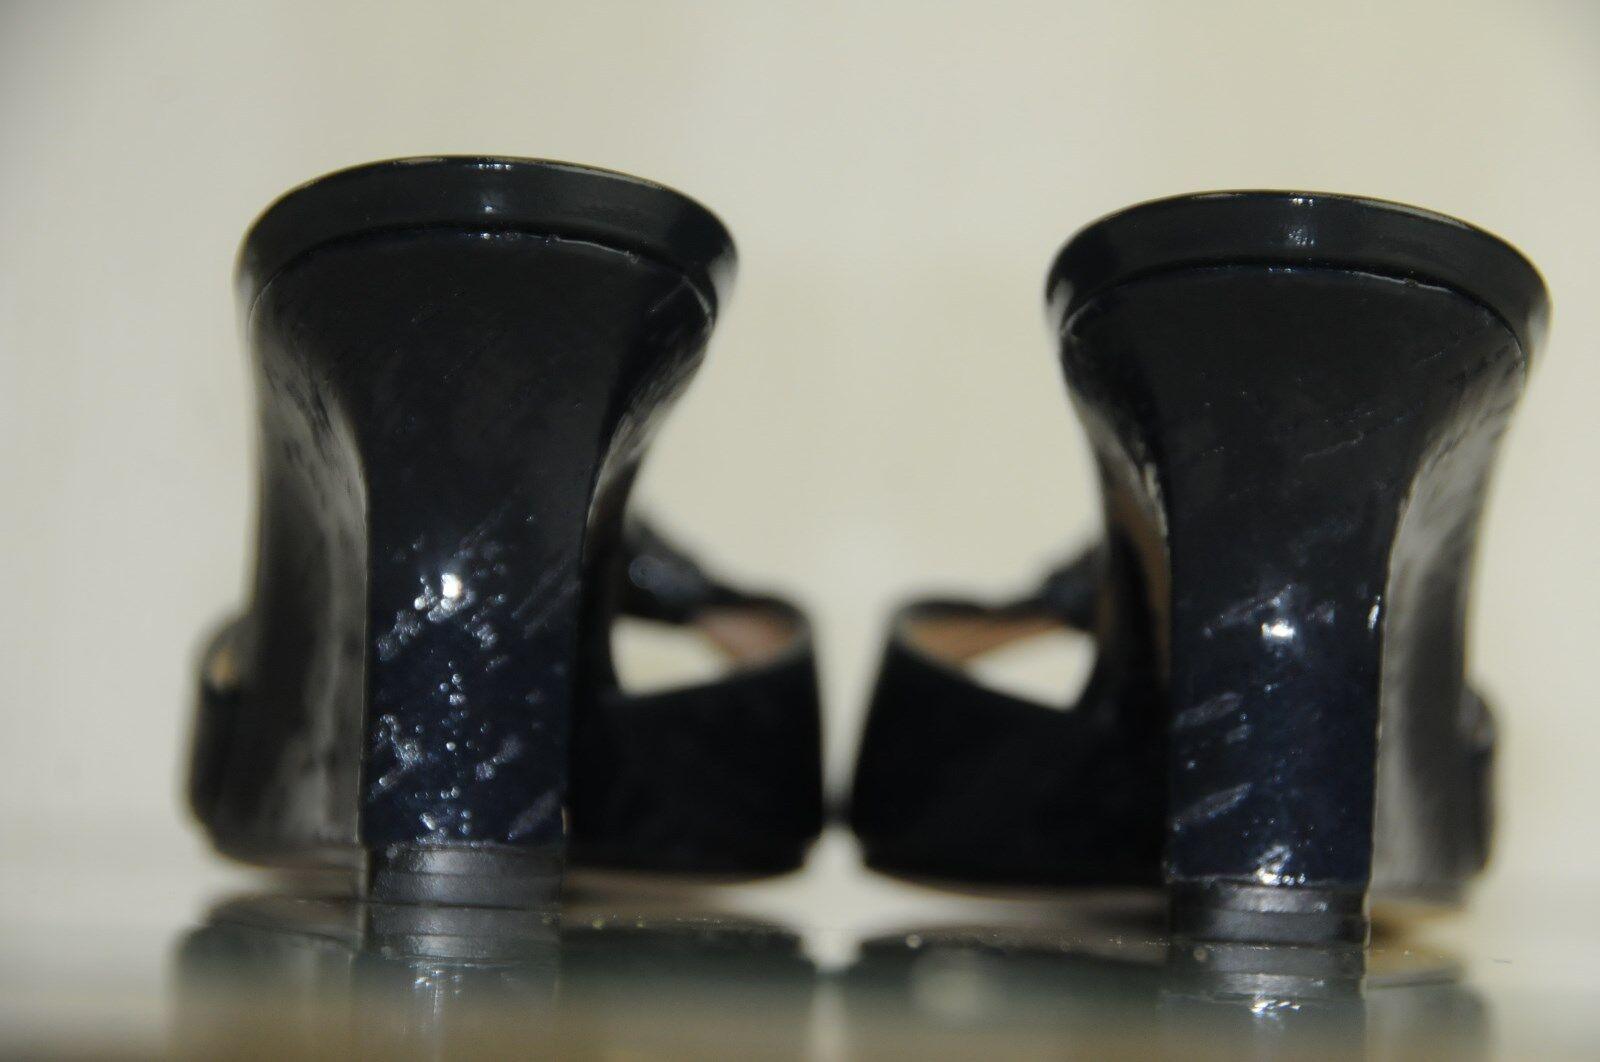 Neuf Manolo Blahnik Laros Bleu Marine Marine Marine Sandales Compensées en Liège Glissière 47c3af